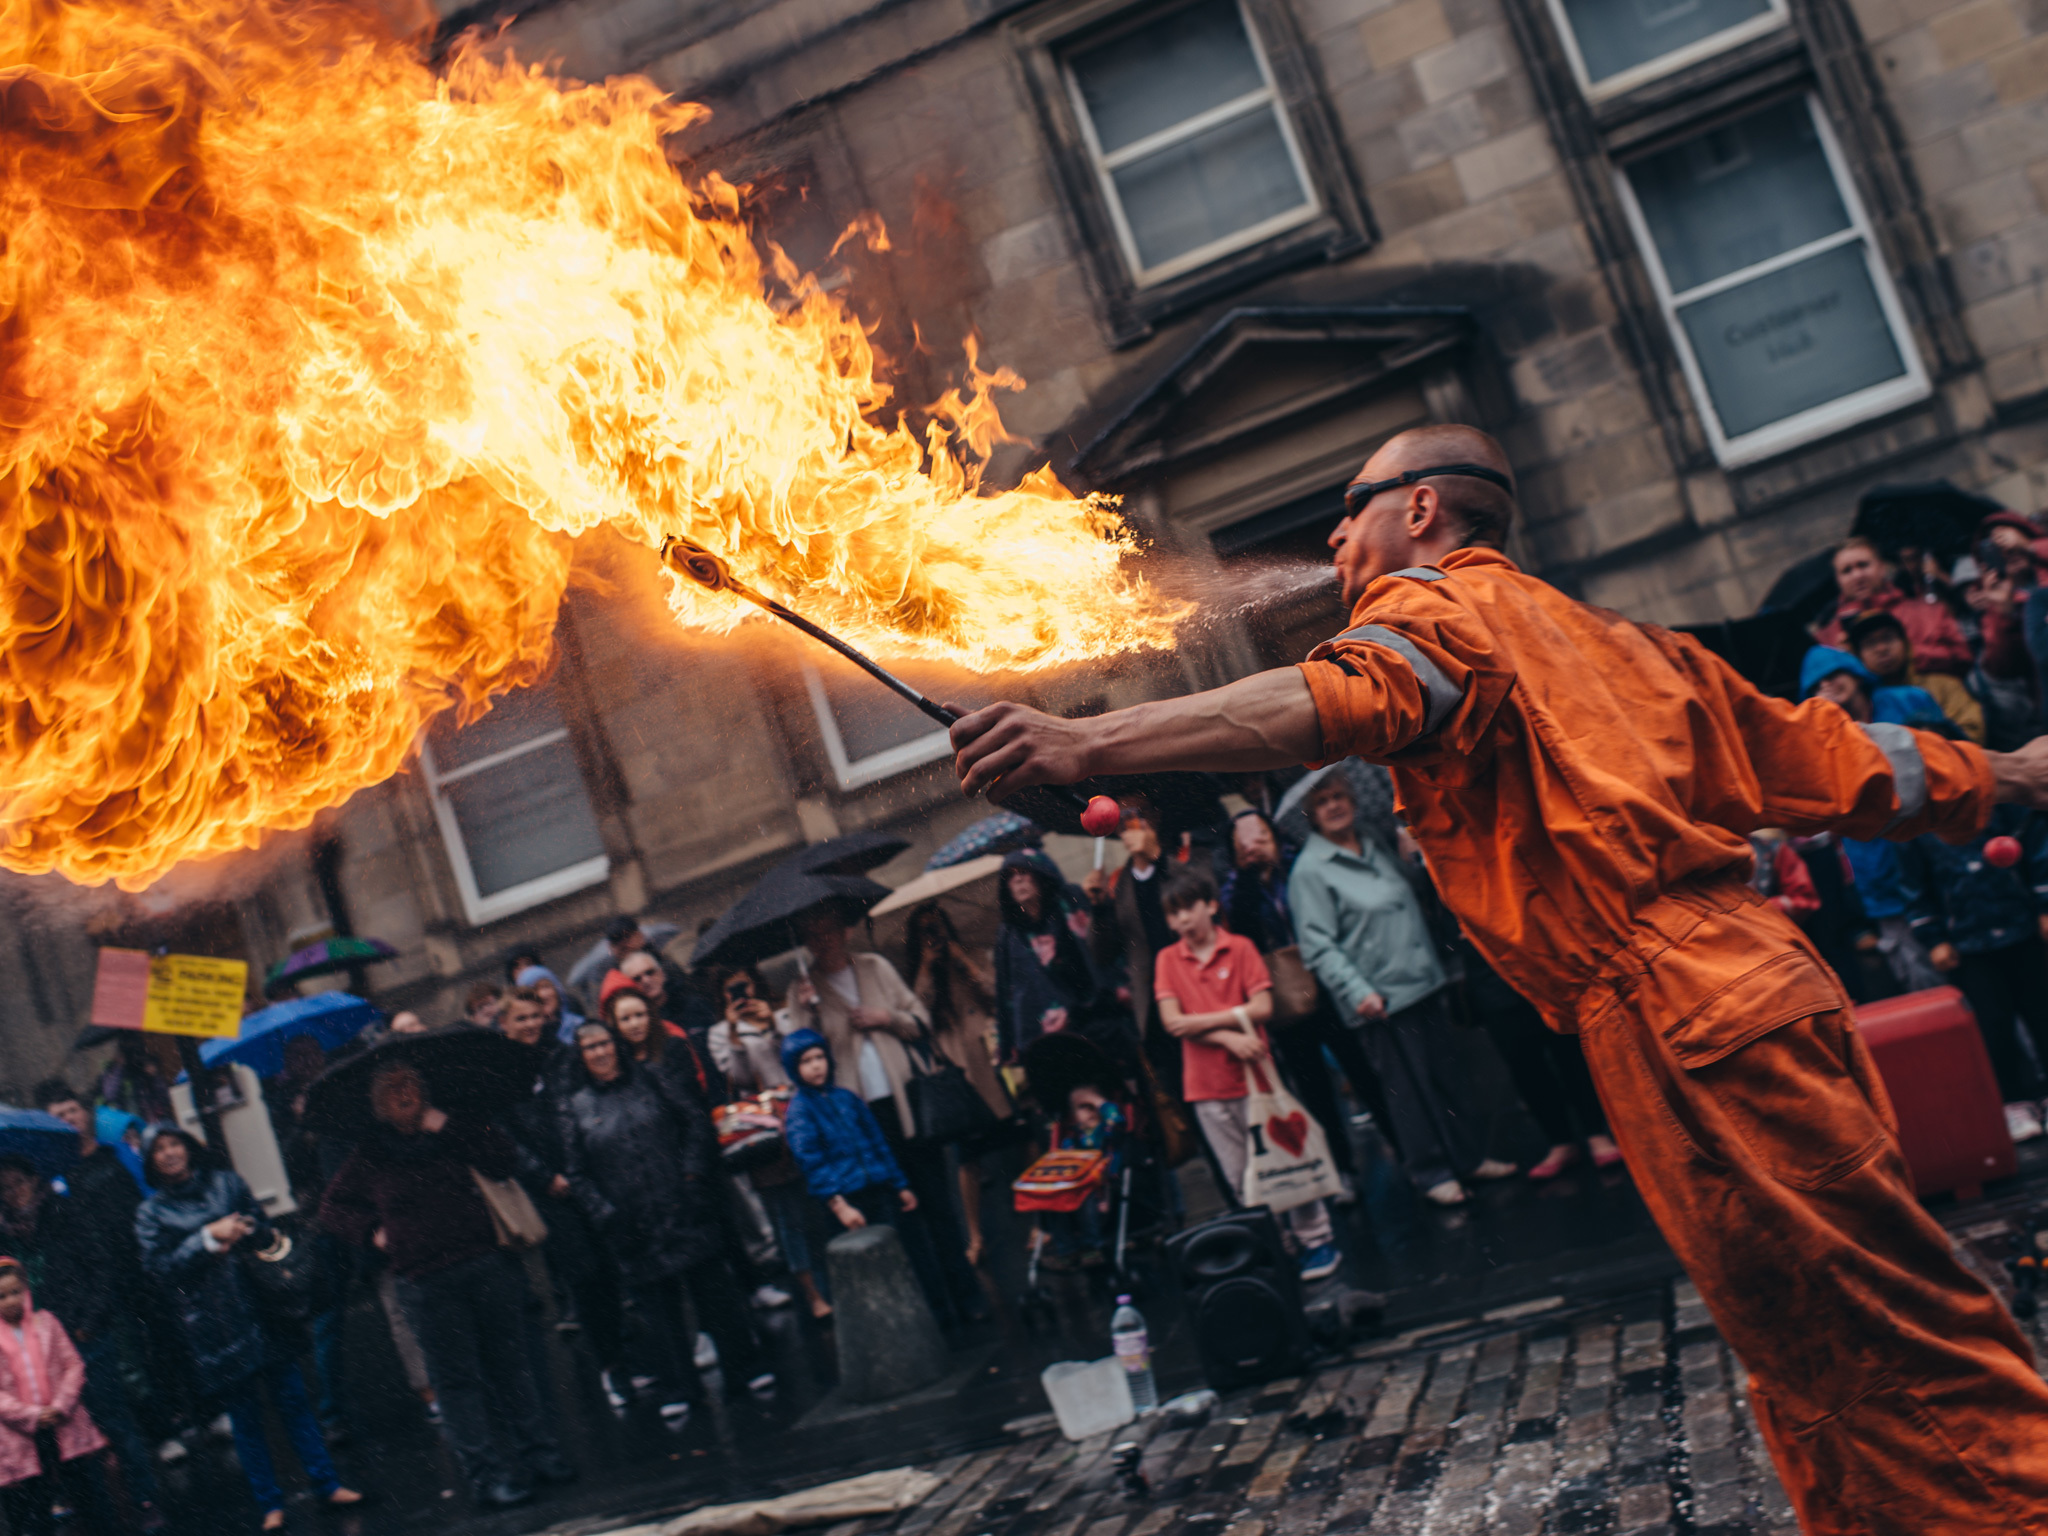 The Edinburgh Festival has been cancelled